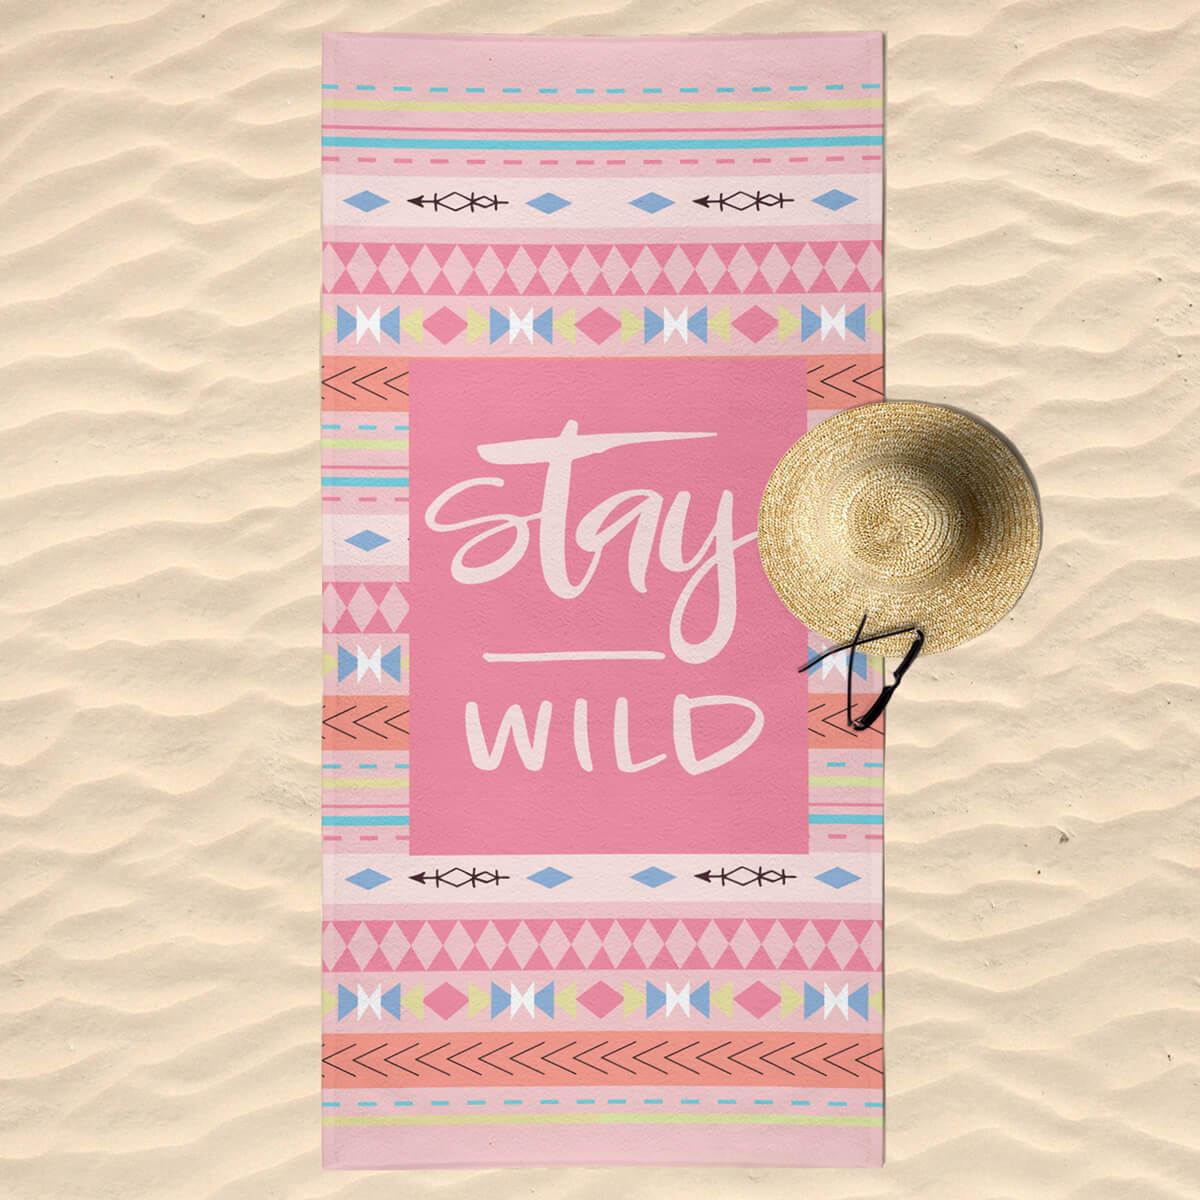 Toalha de Praia Estampada Stay Wild